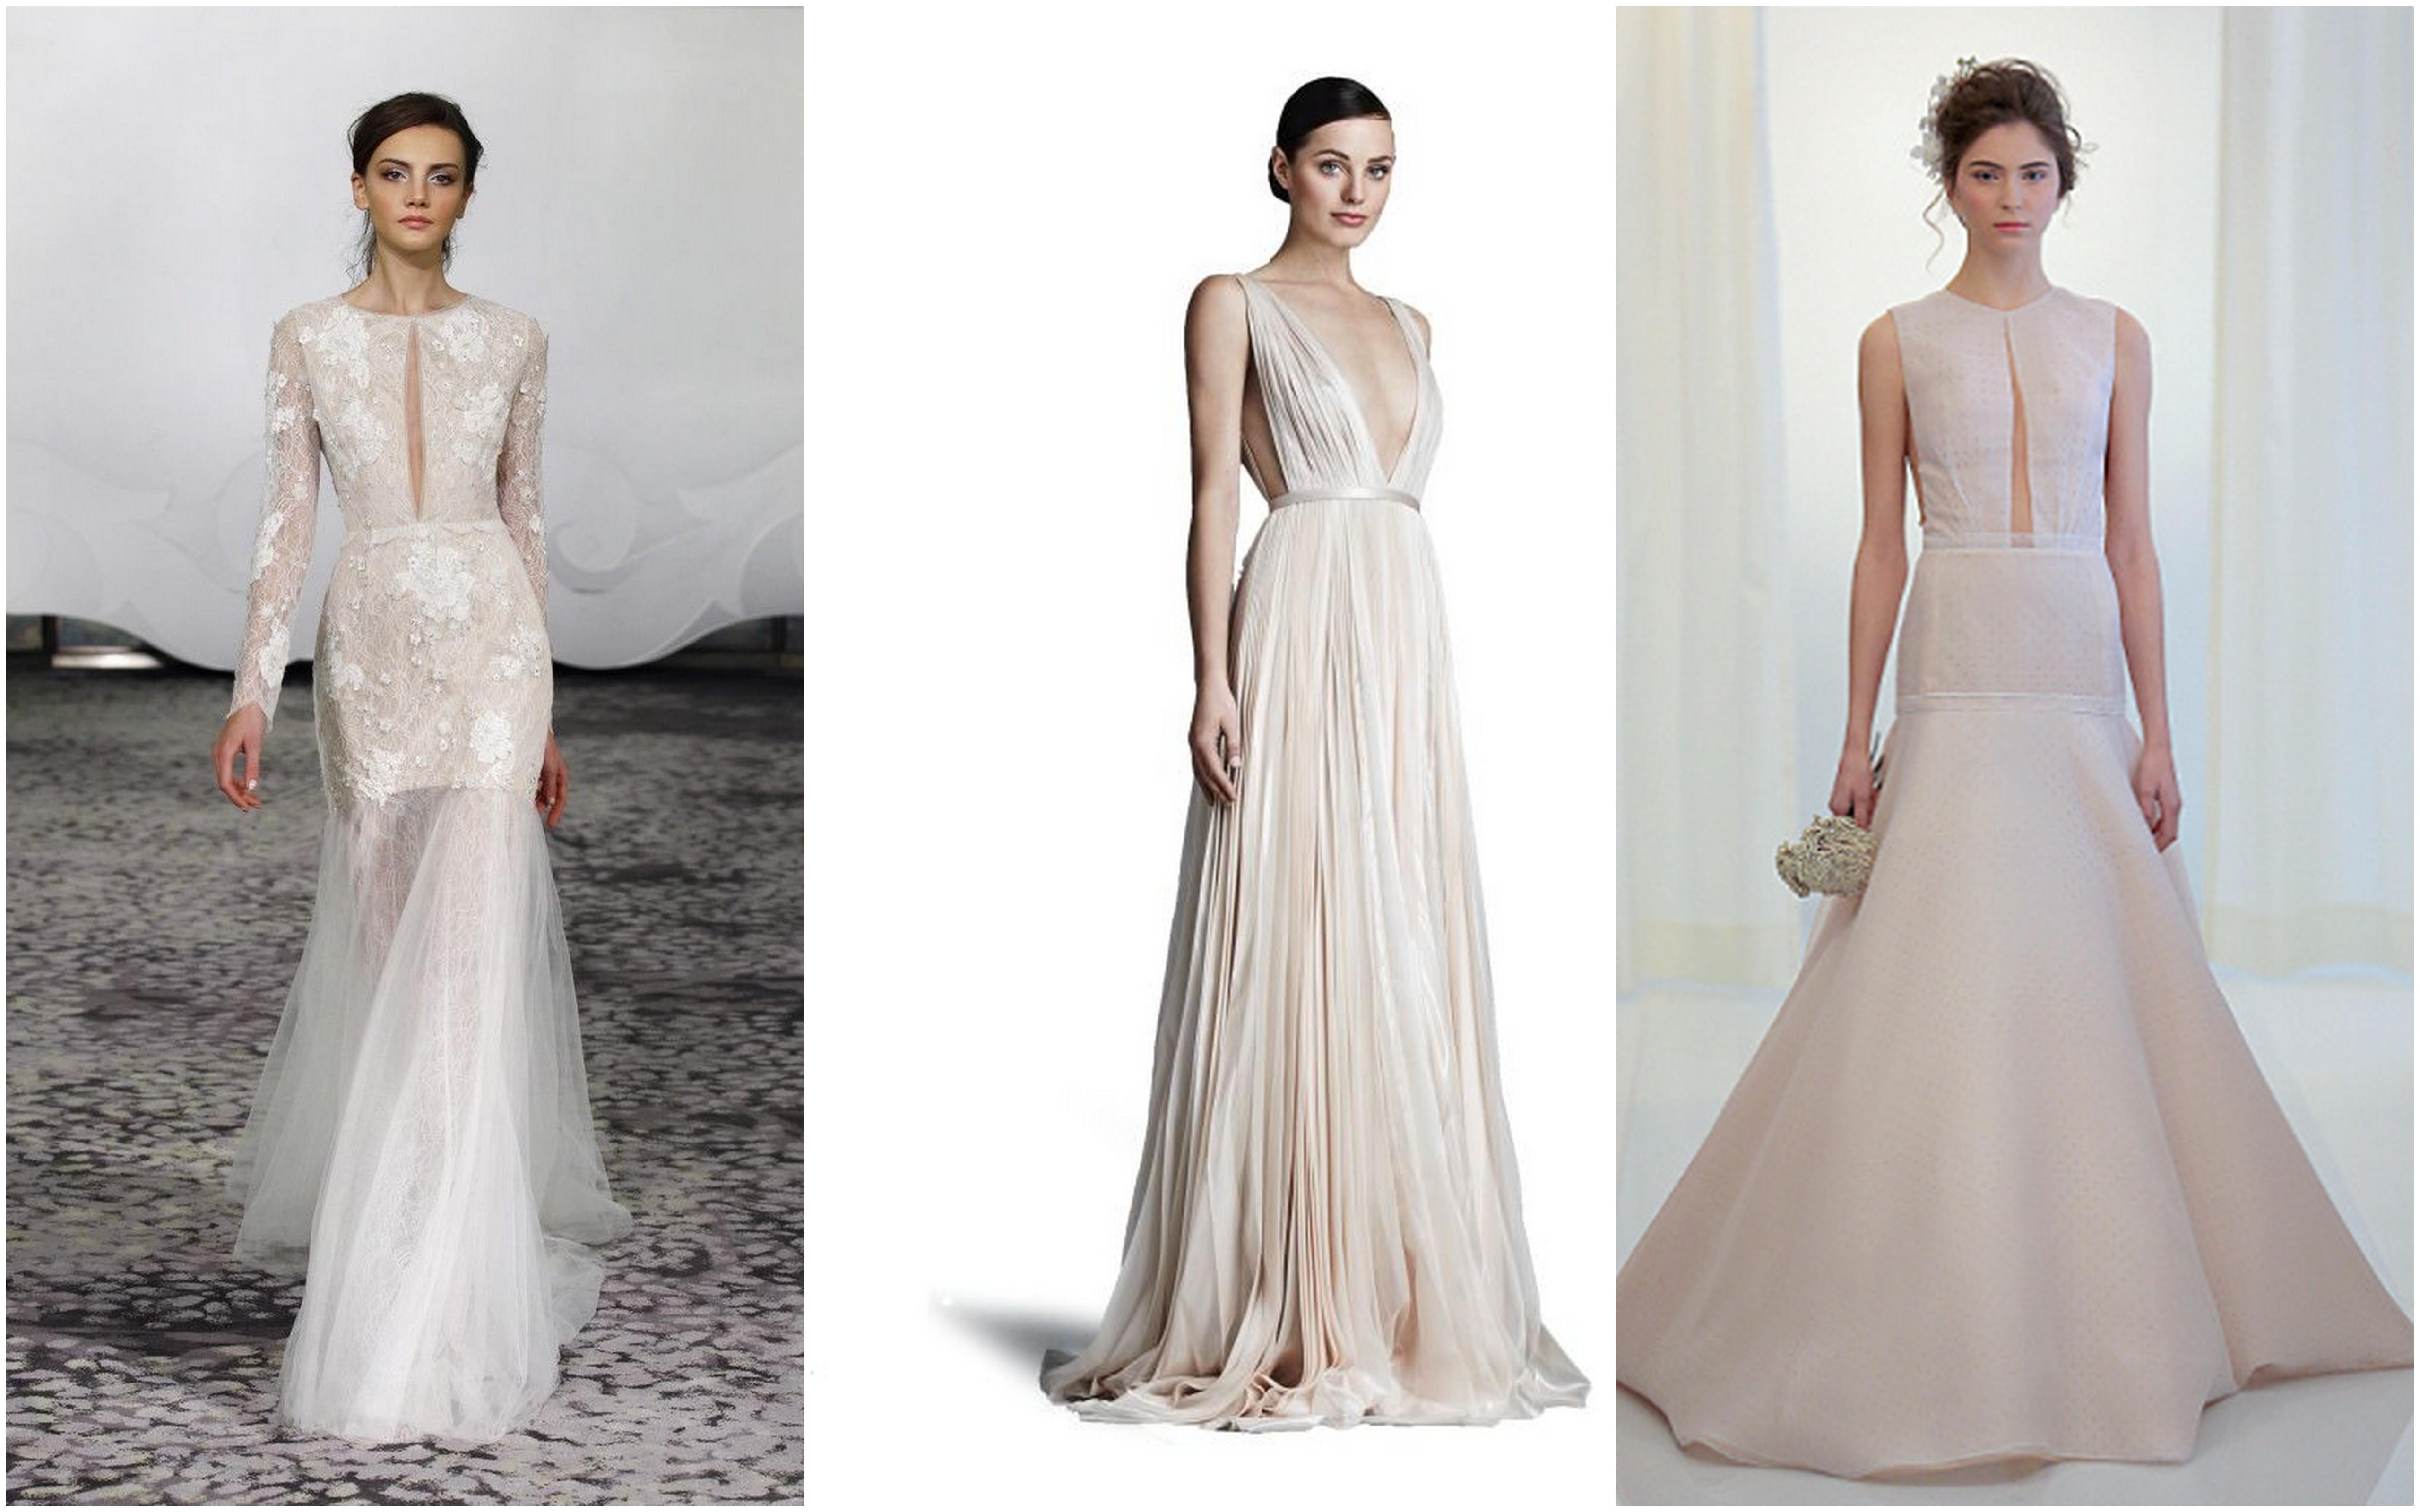 wedding dress trends plunge wedding dress Wedding Dress trends Keyhole and Plunge